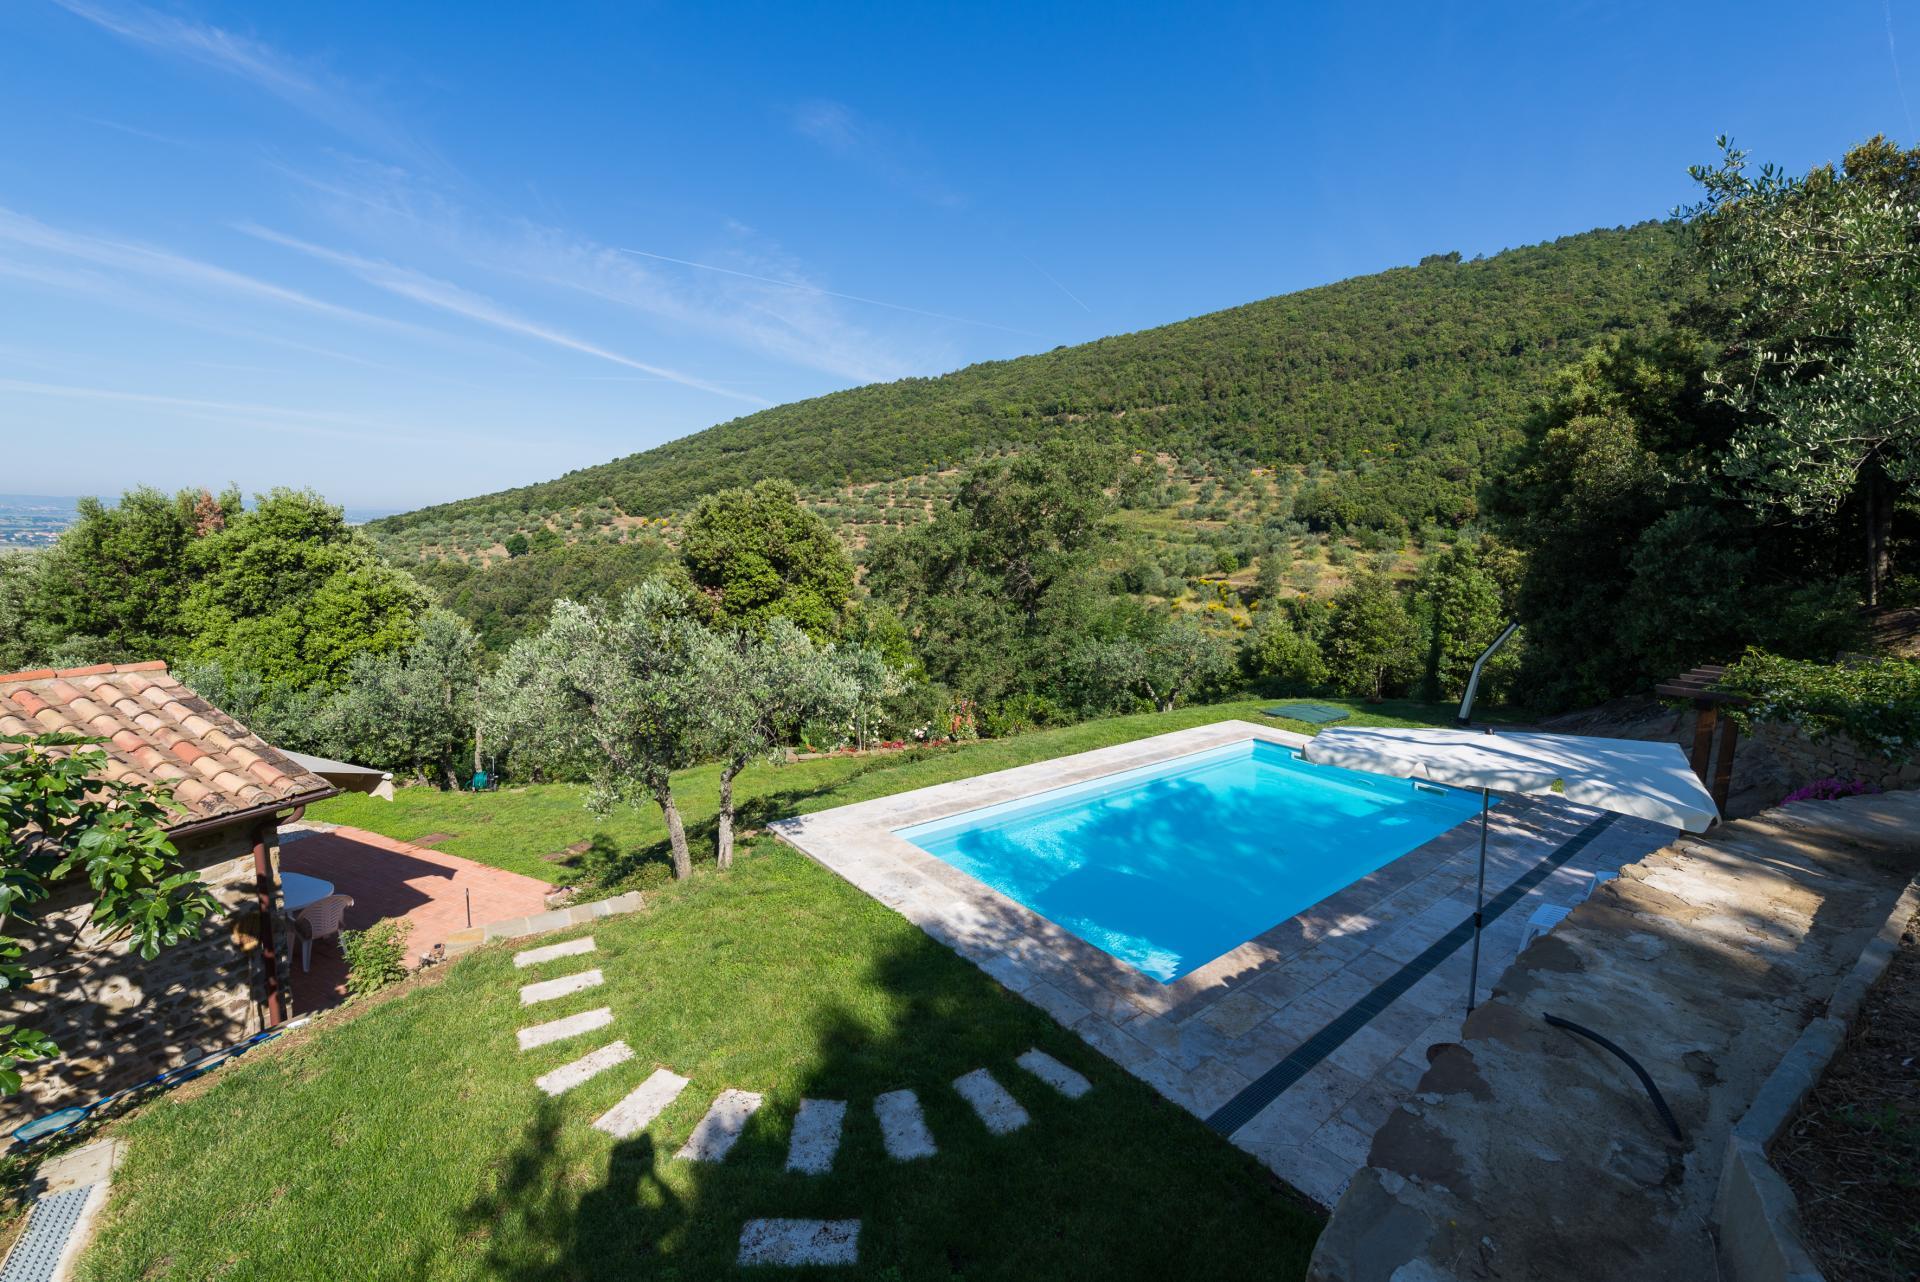 Cortona villa with pool